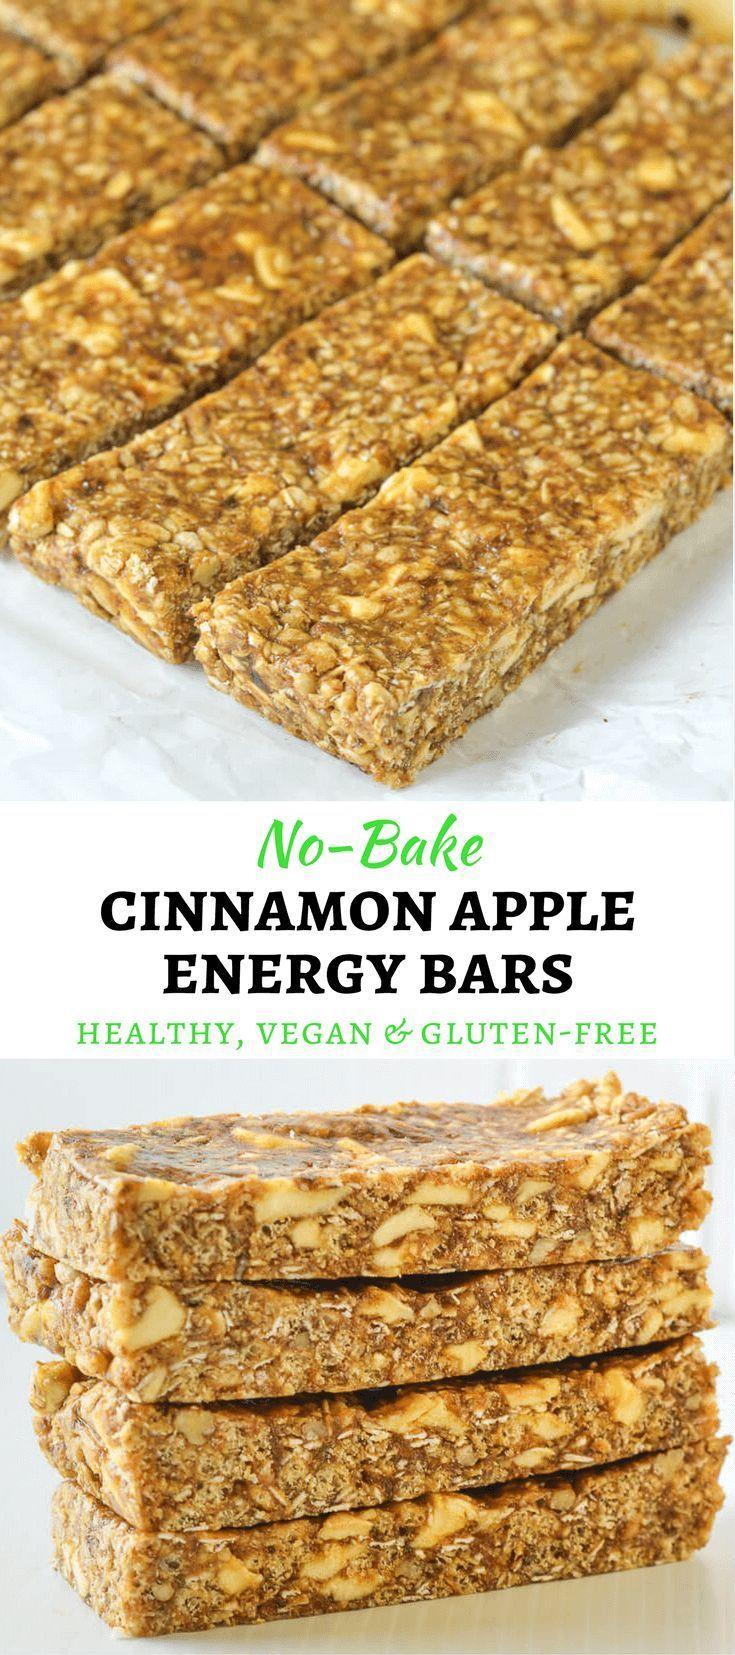 Incredibly delicious No-Bake Cinnamon Apple Energy Bars. A delicious mix of chewy & crispy & so quick & easy to make!  via @avirtualvegan